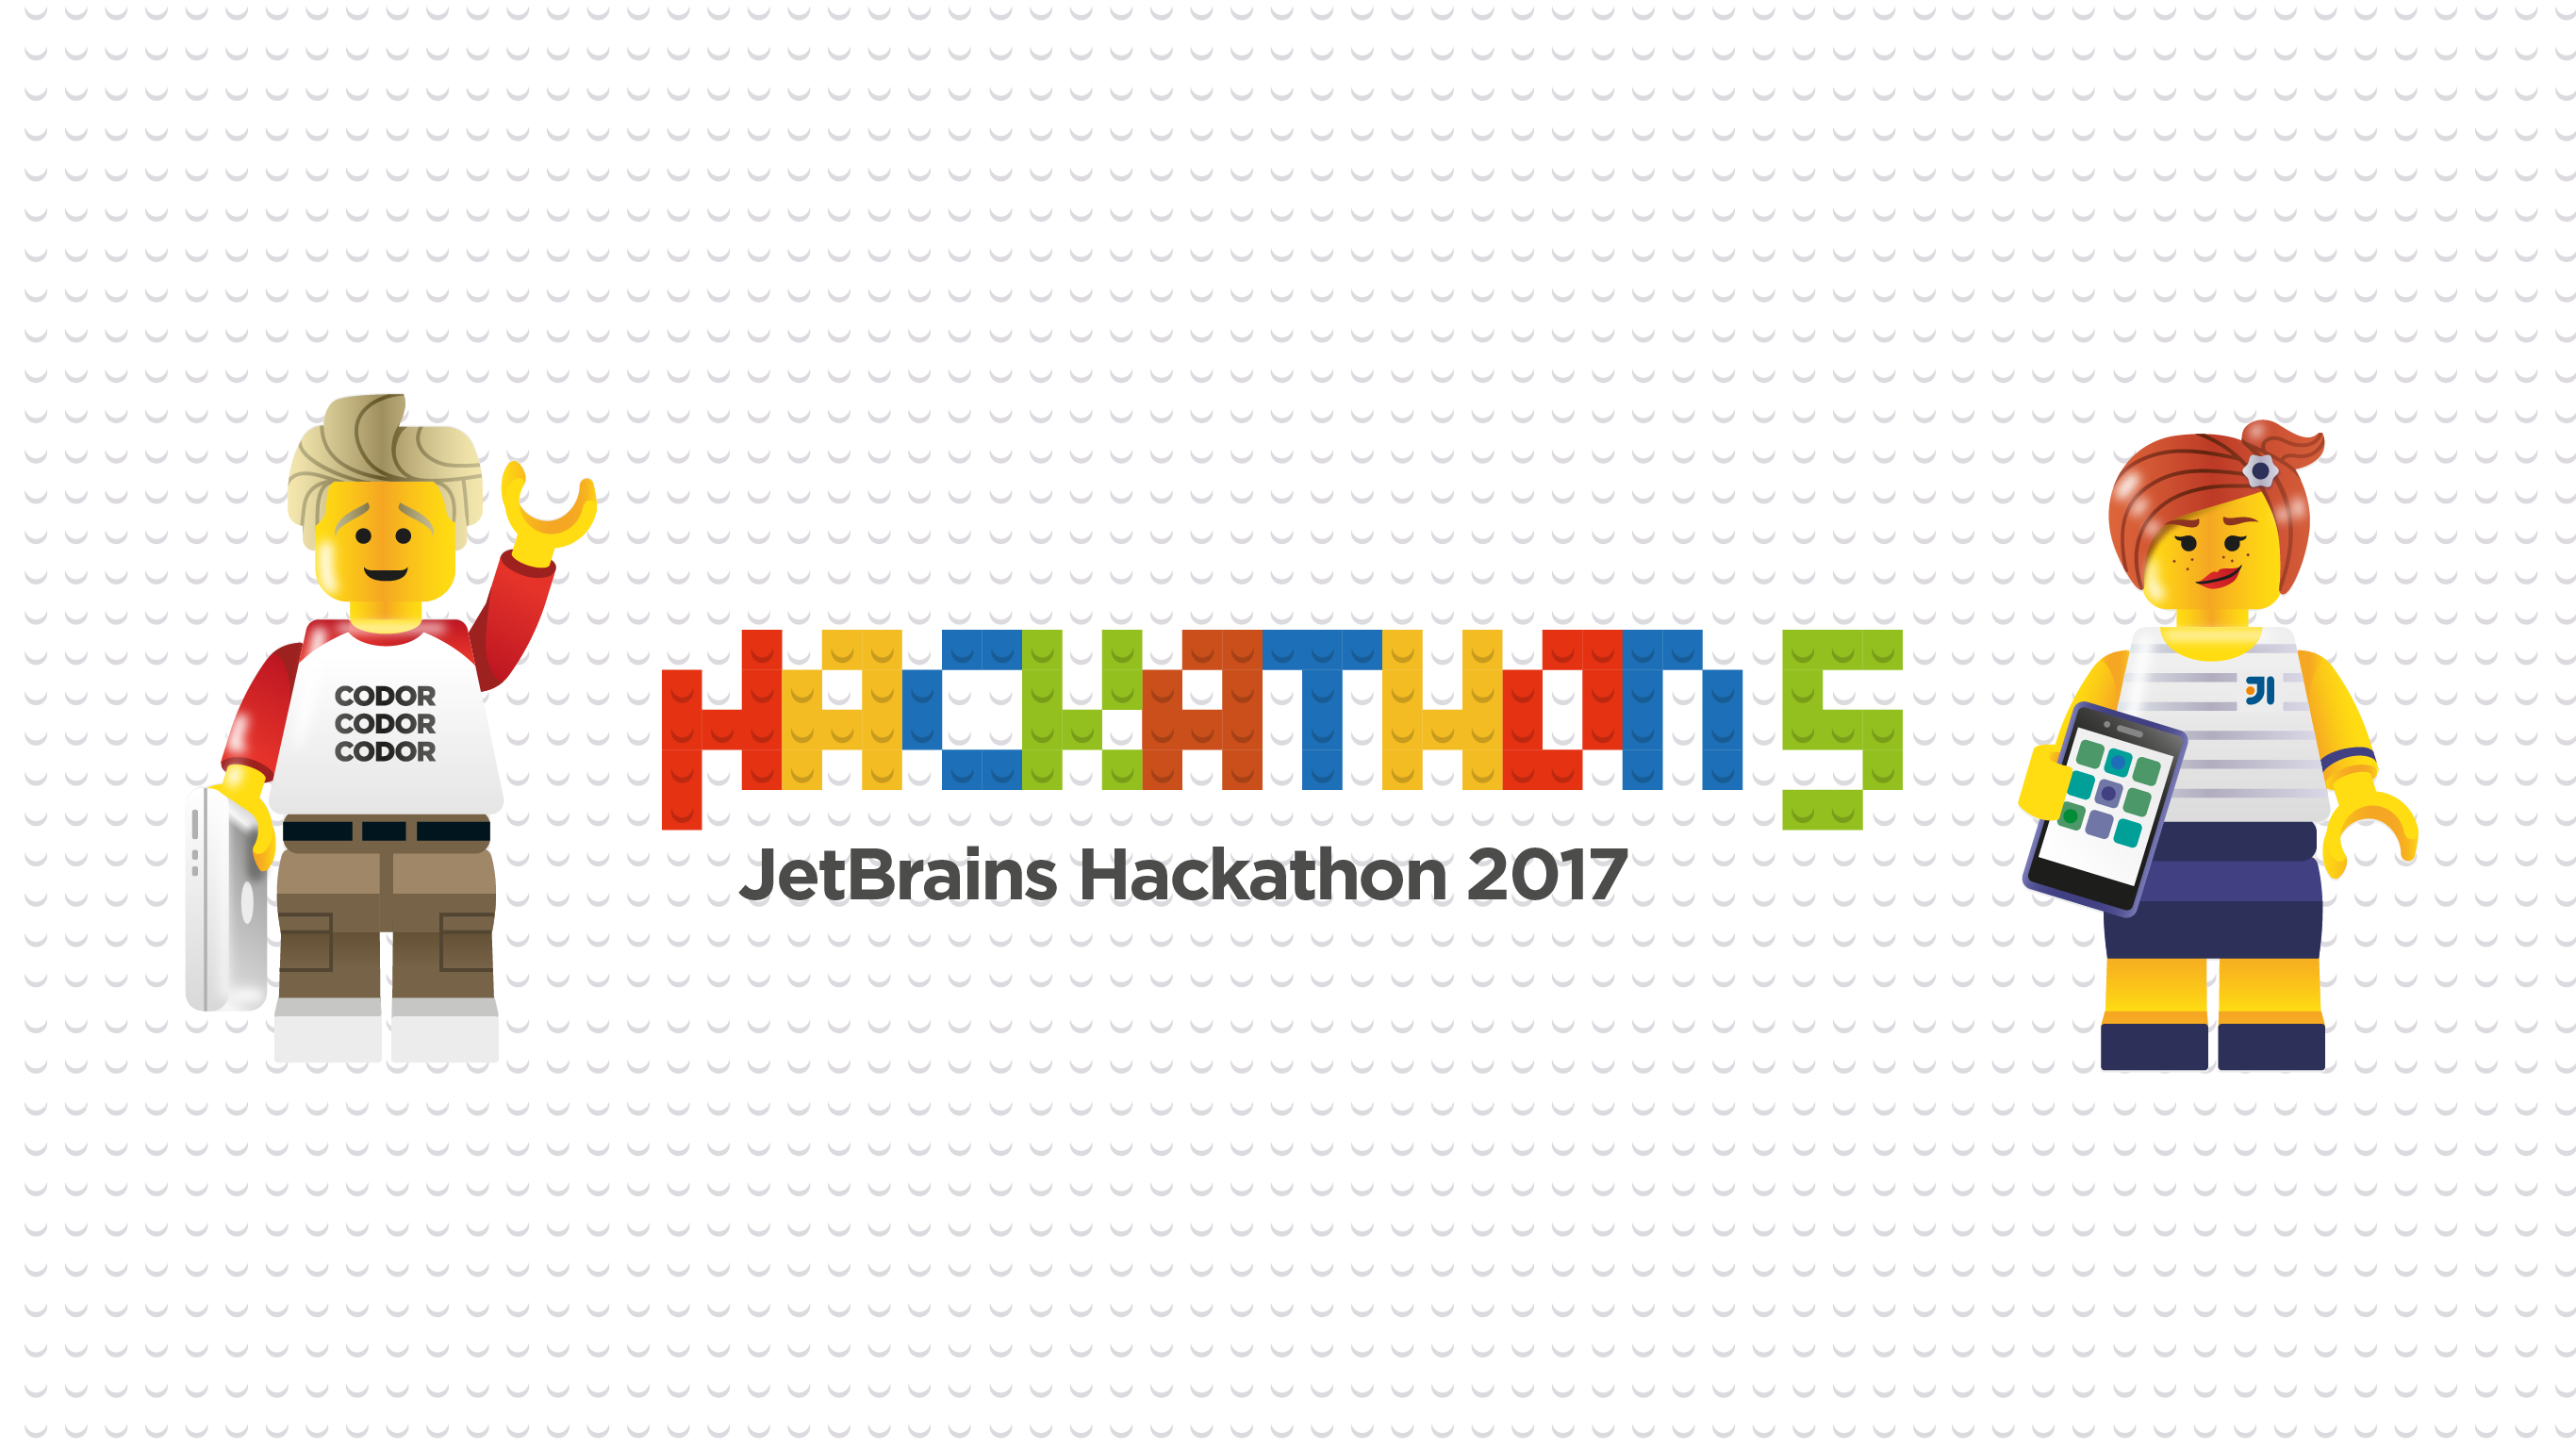 JetBrains Hackathon 2017